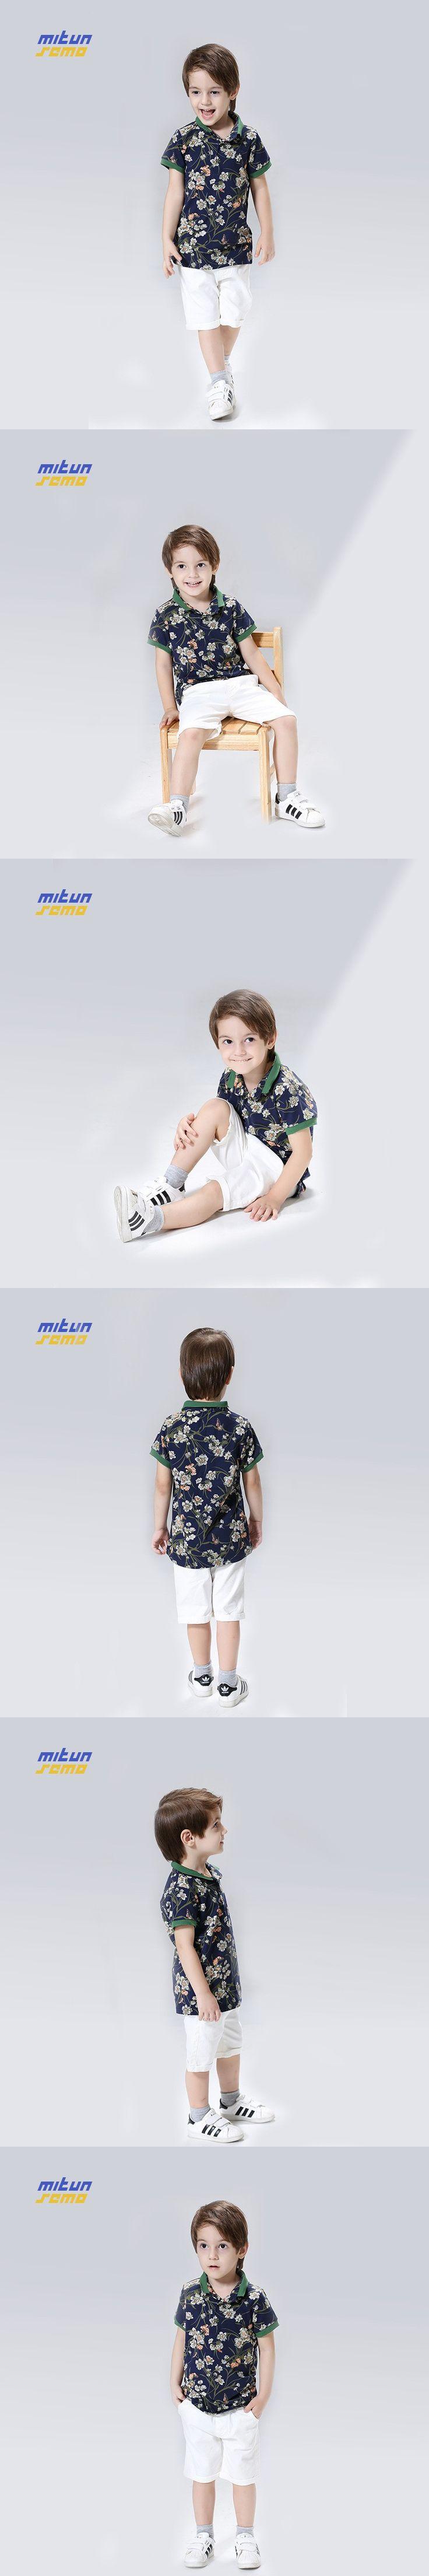 110-150cm Boys Short Floral T Shirt Vetement Garcon Boys Clothing Toddler Boys Clothing Abbigliamento Bambini Kids Boy Clothes